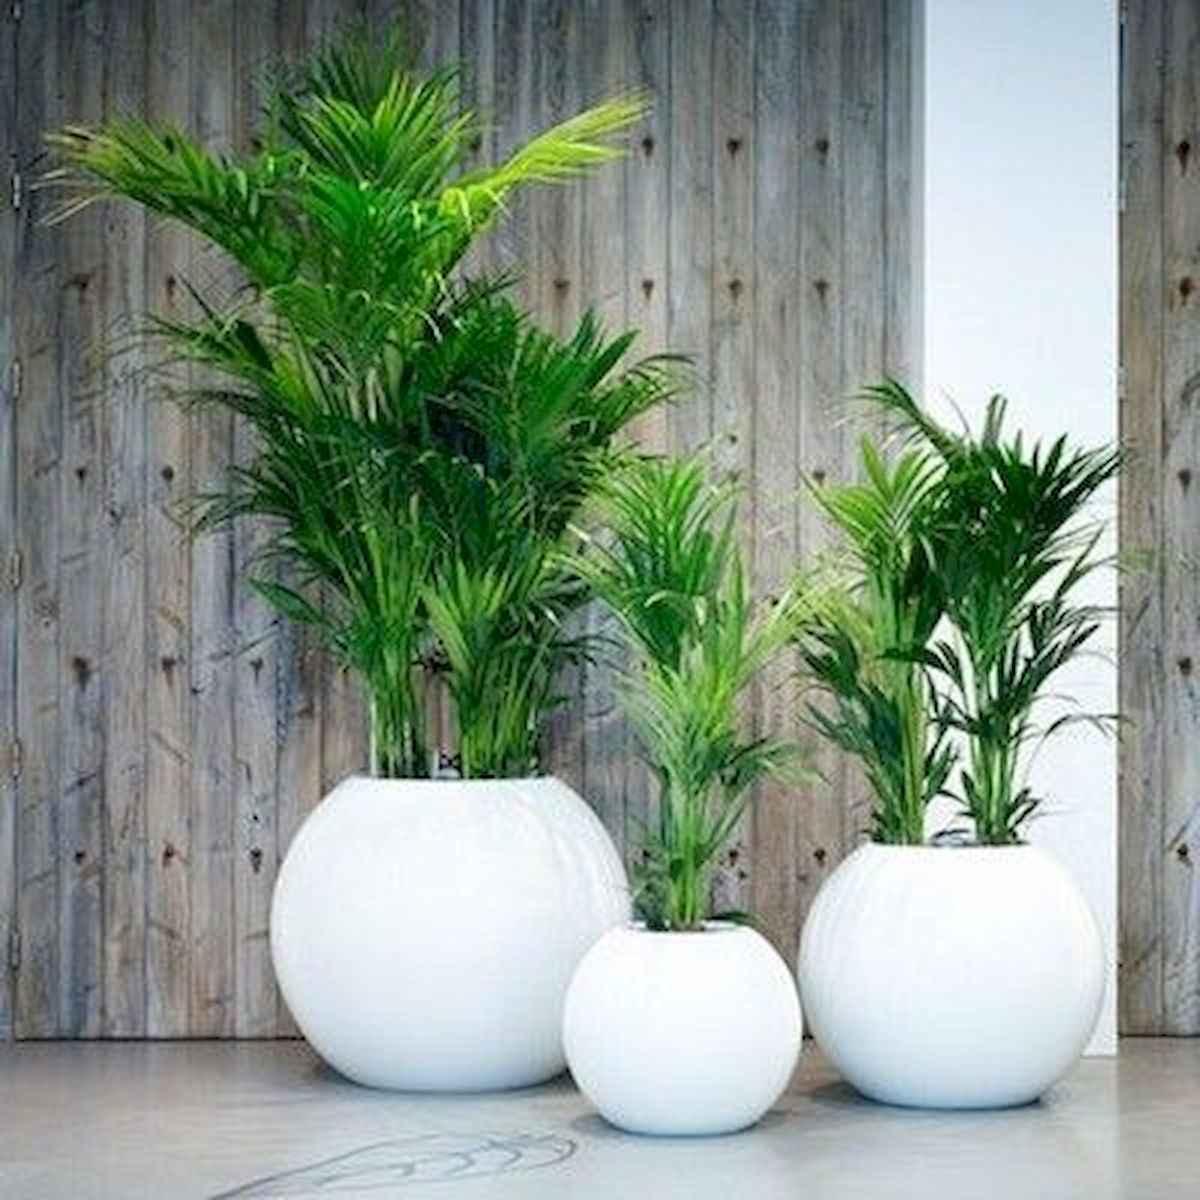 50 Best Indoor Garden For Apartment Design Ideas And Remodel (20)